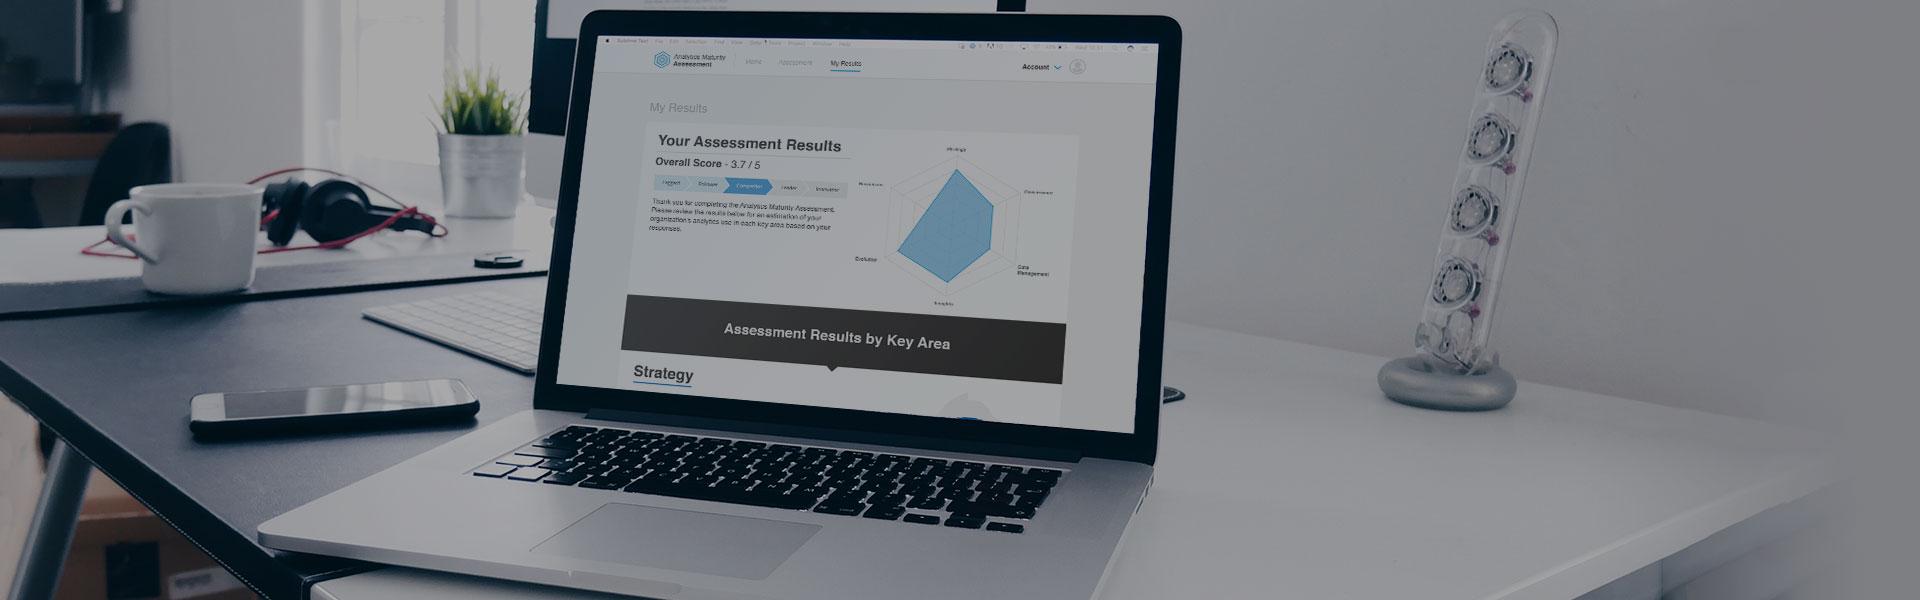 analytics maturity assessment being taken